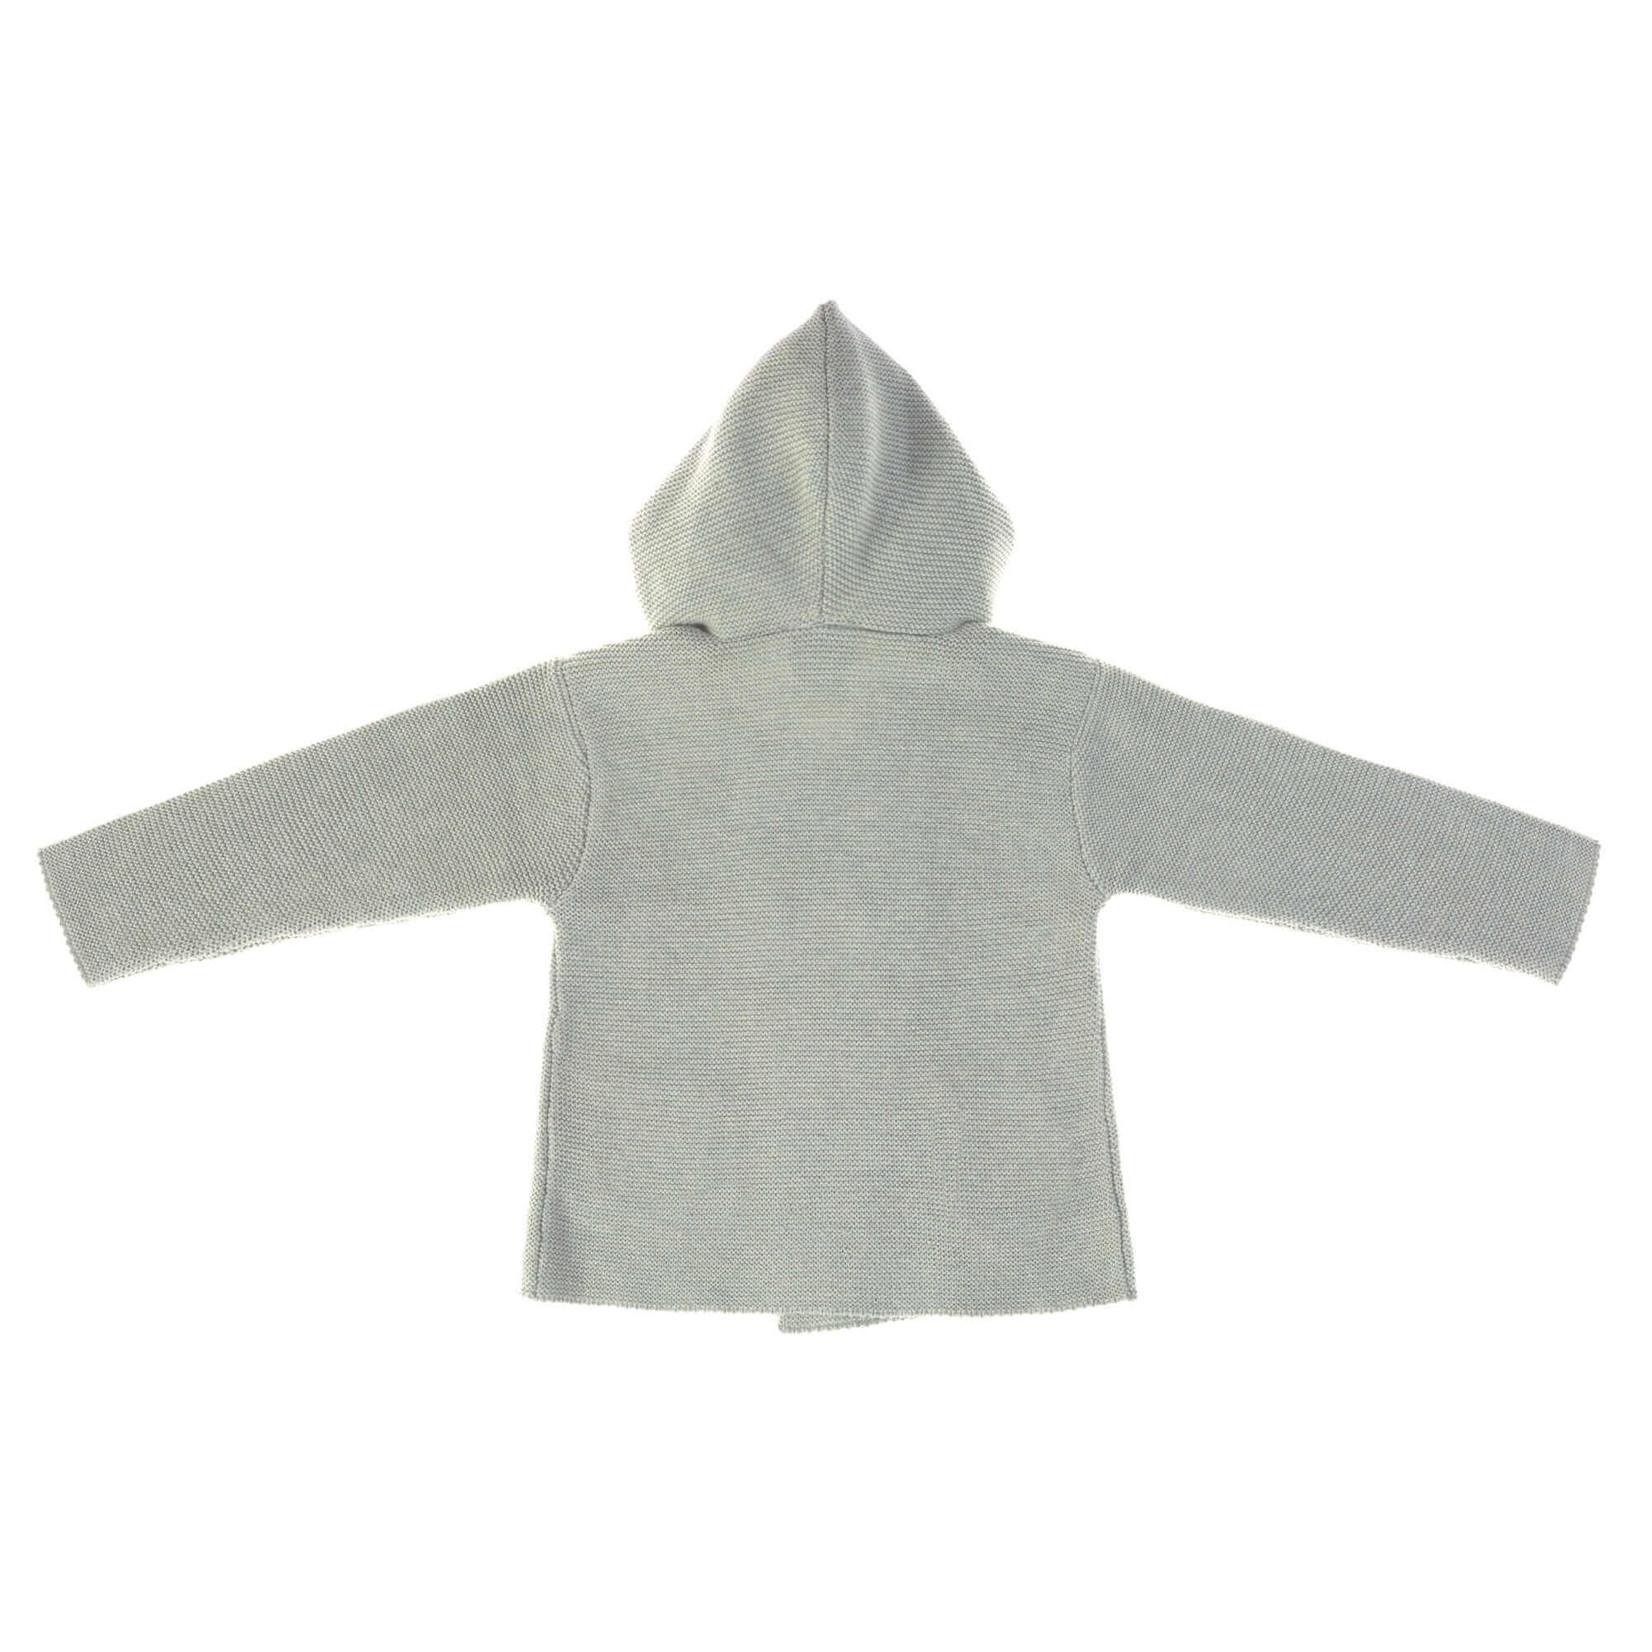 Lässig Knitted Hoodie Gots  Garden Explorer  Aqua Grey